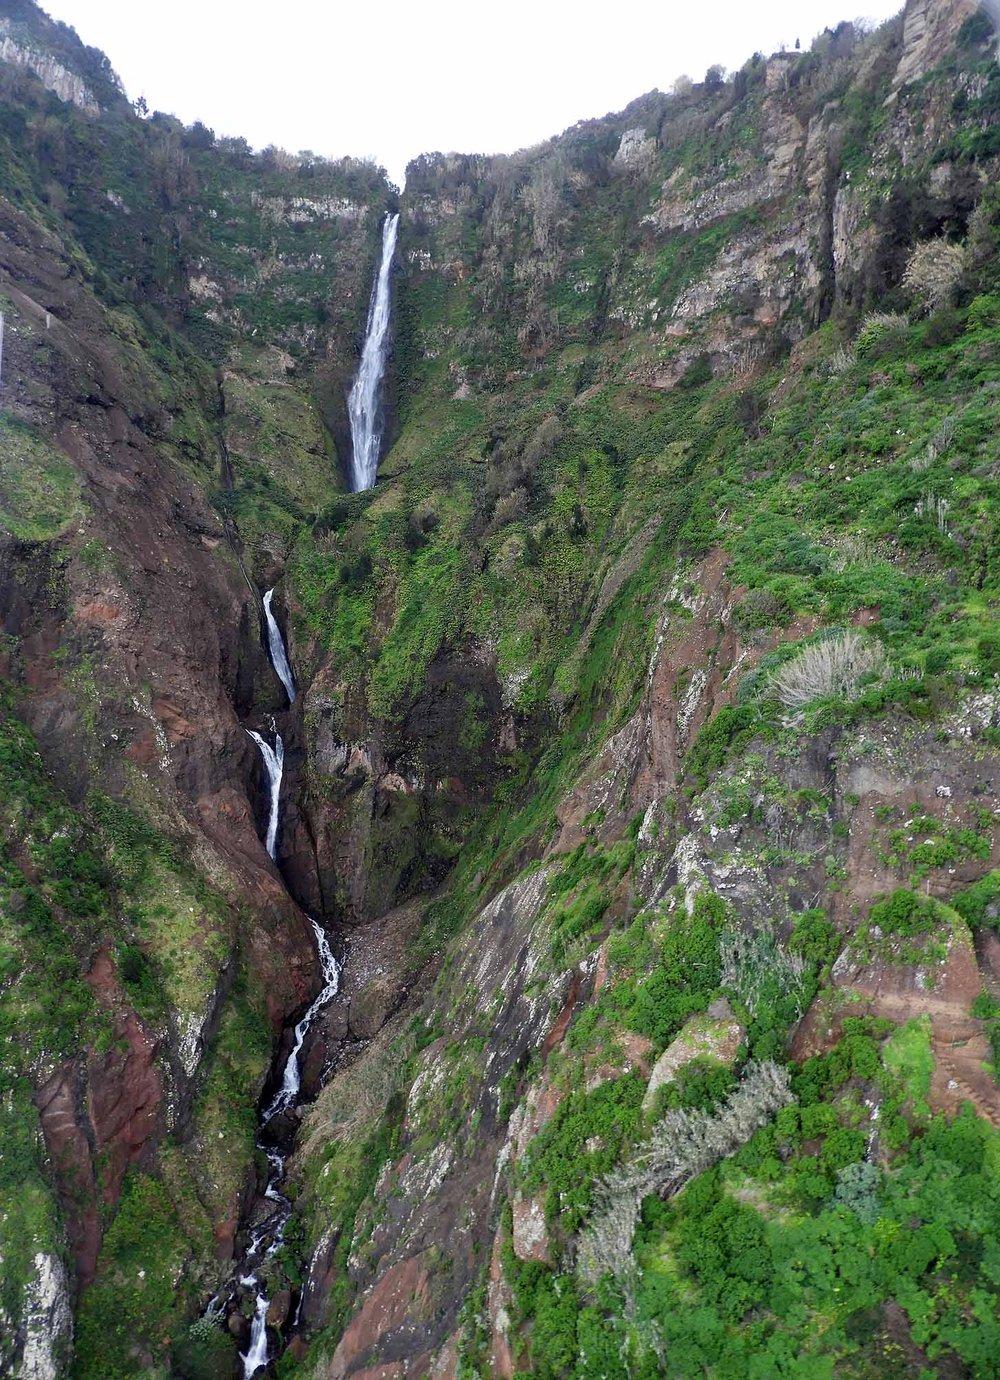 portugal-madeira-rocha-do-navio-teleferico-waterfall.JPG